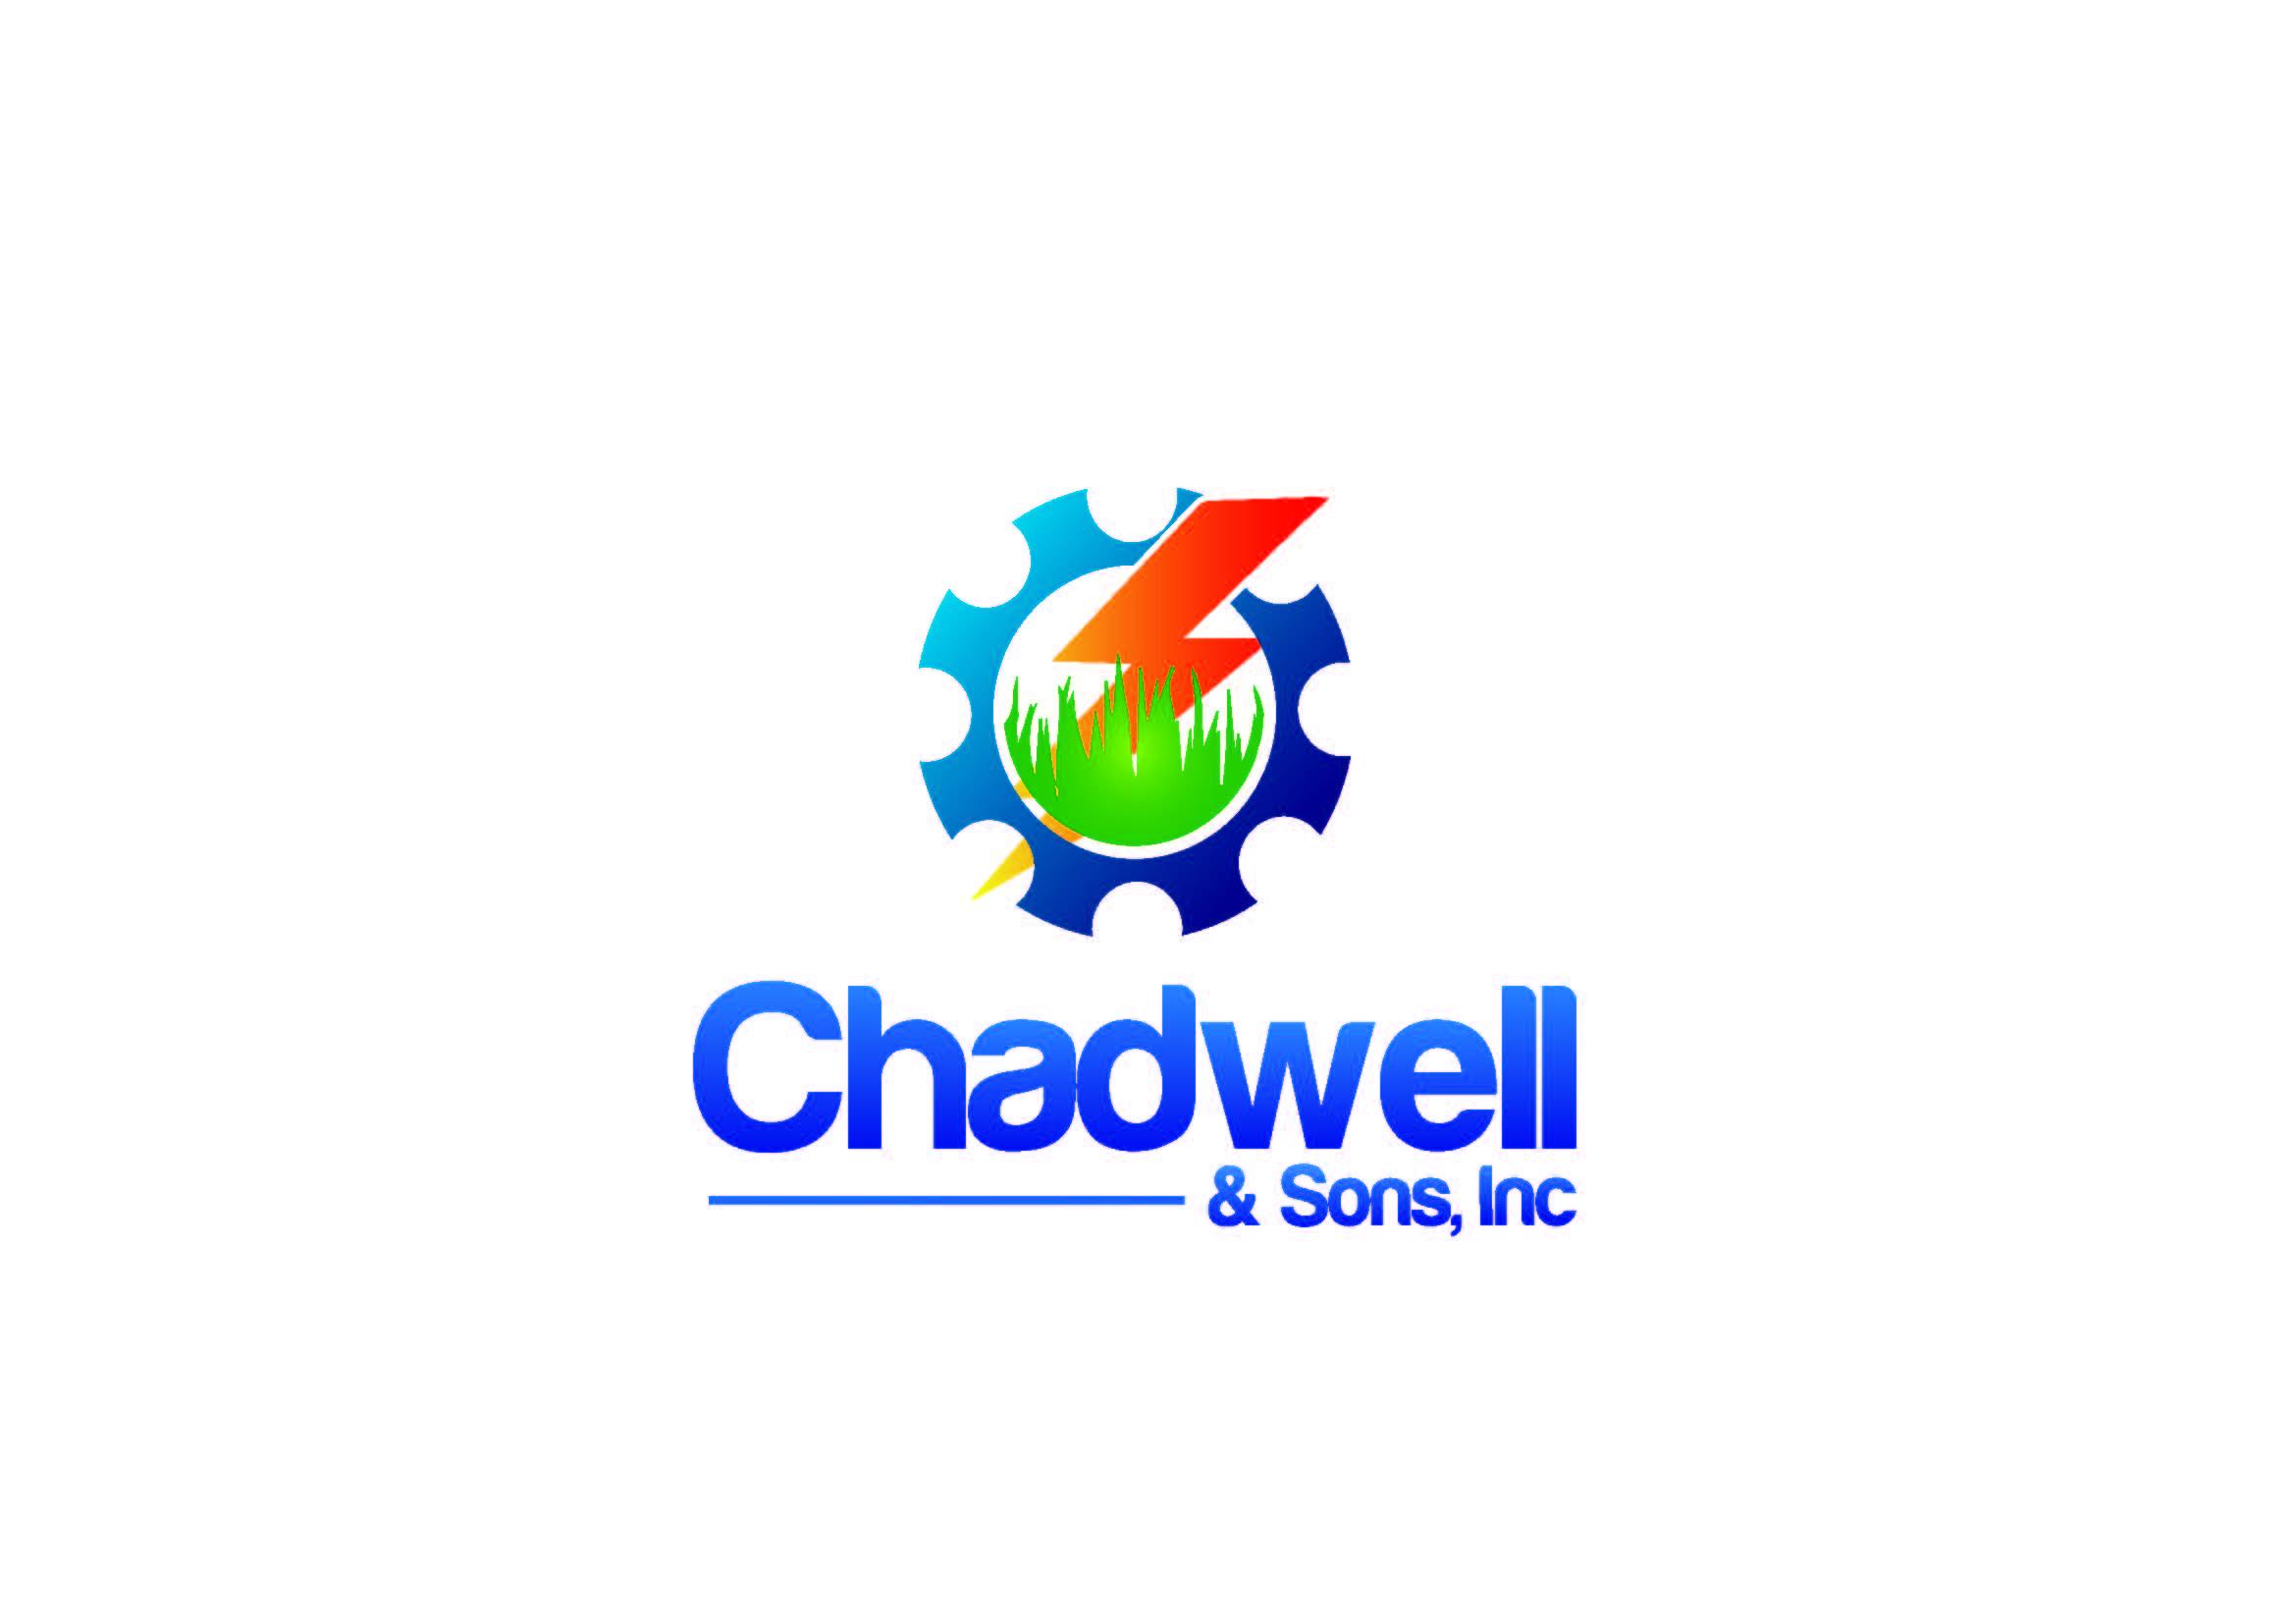 Chadwell_Sons2.jpg